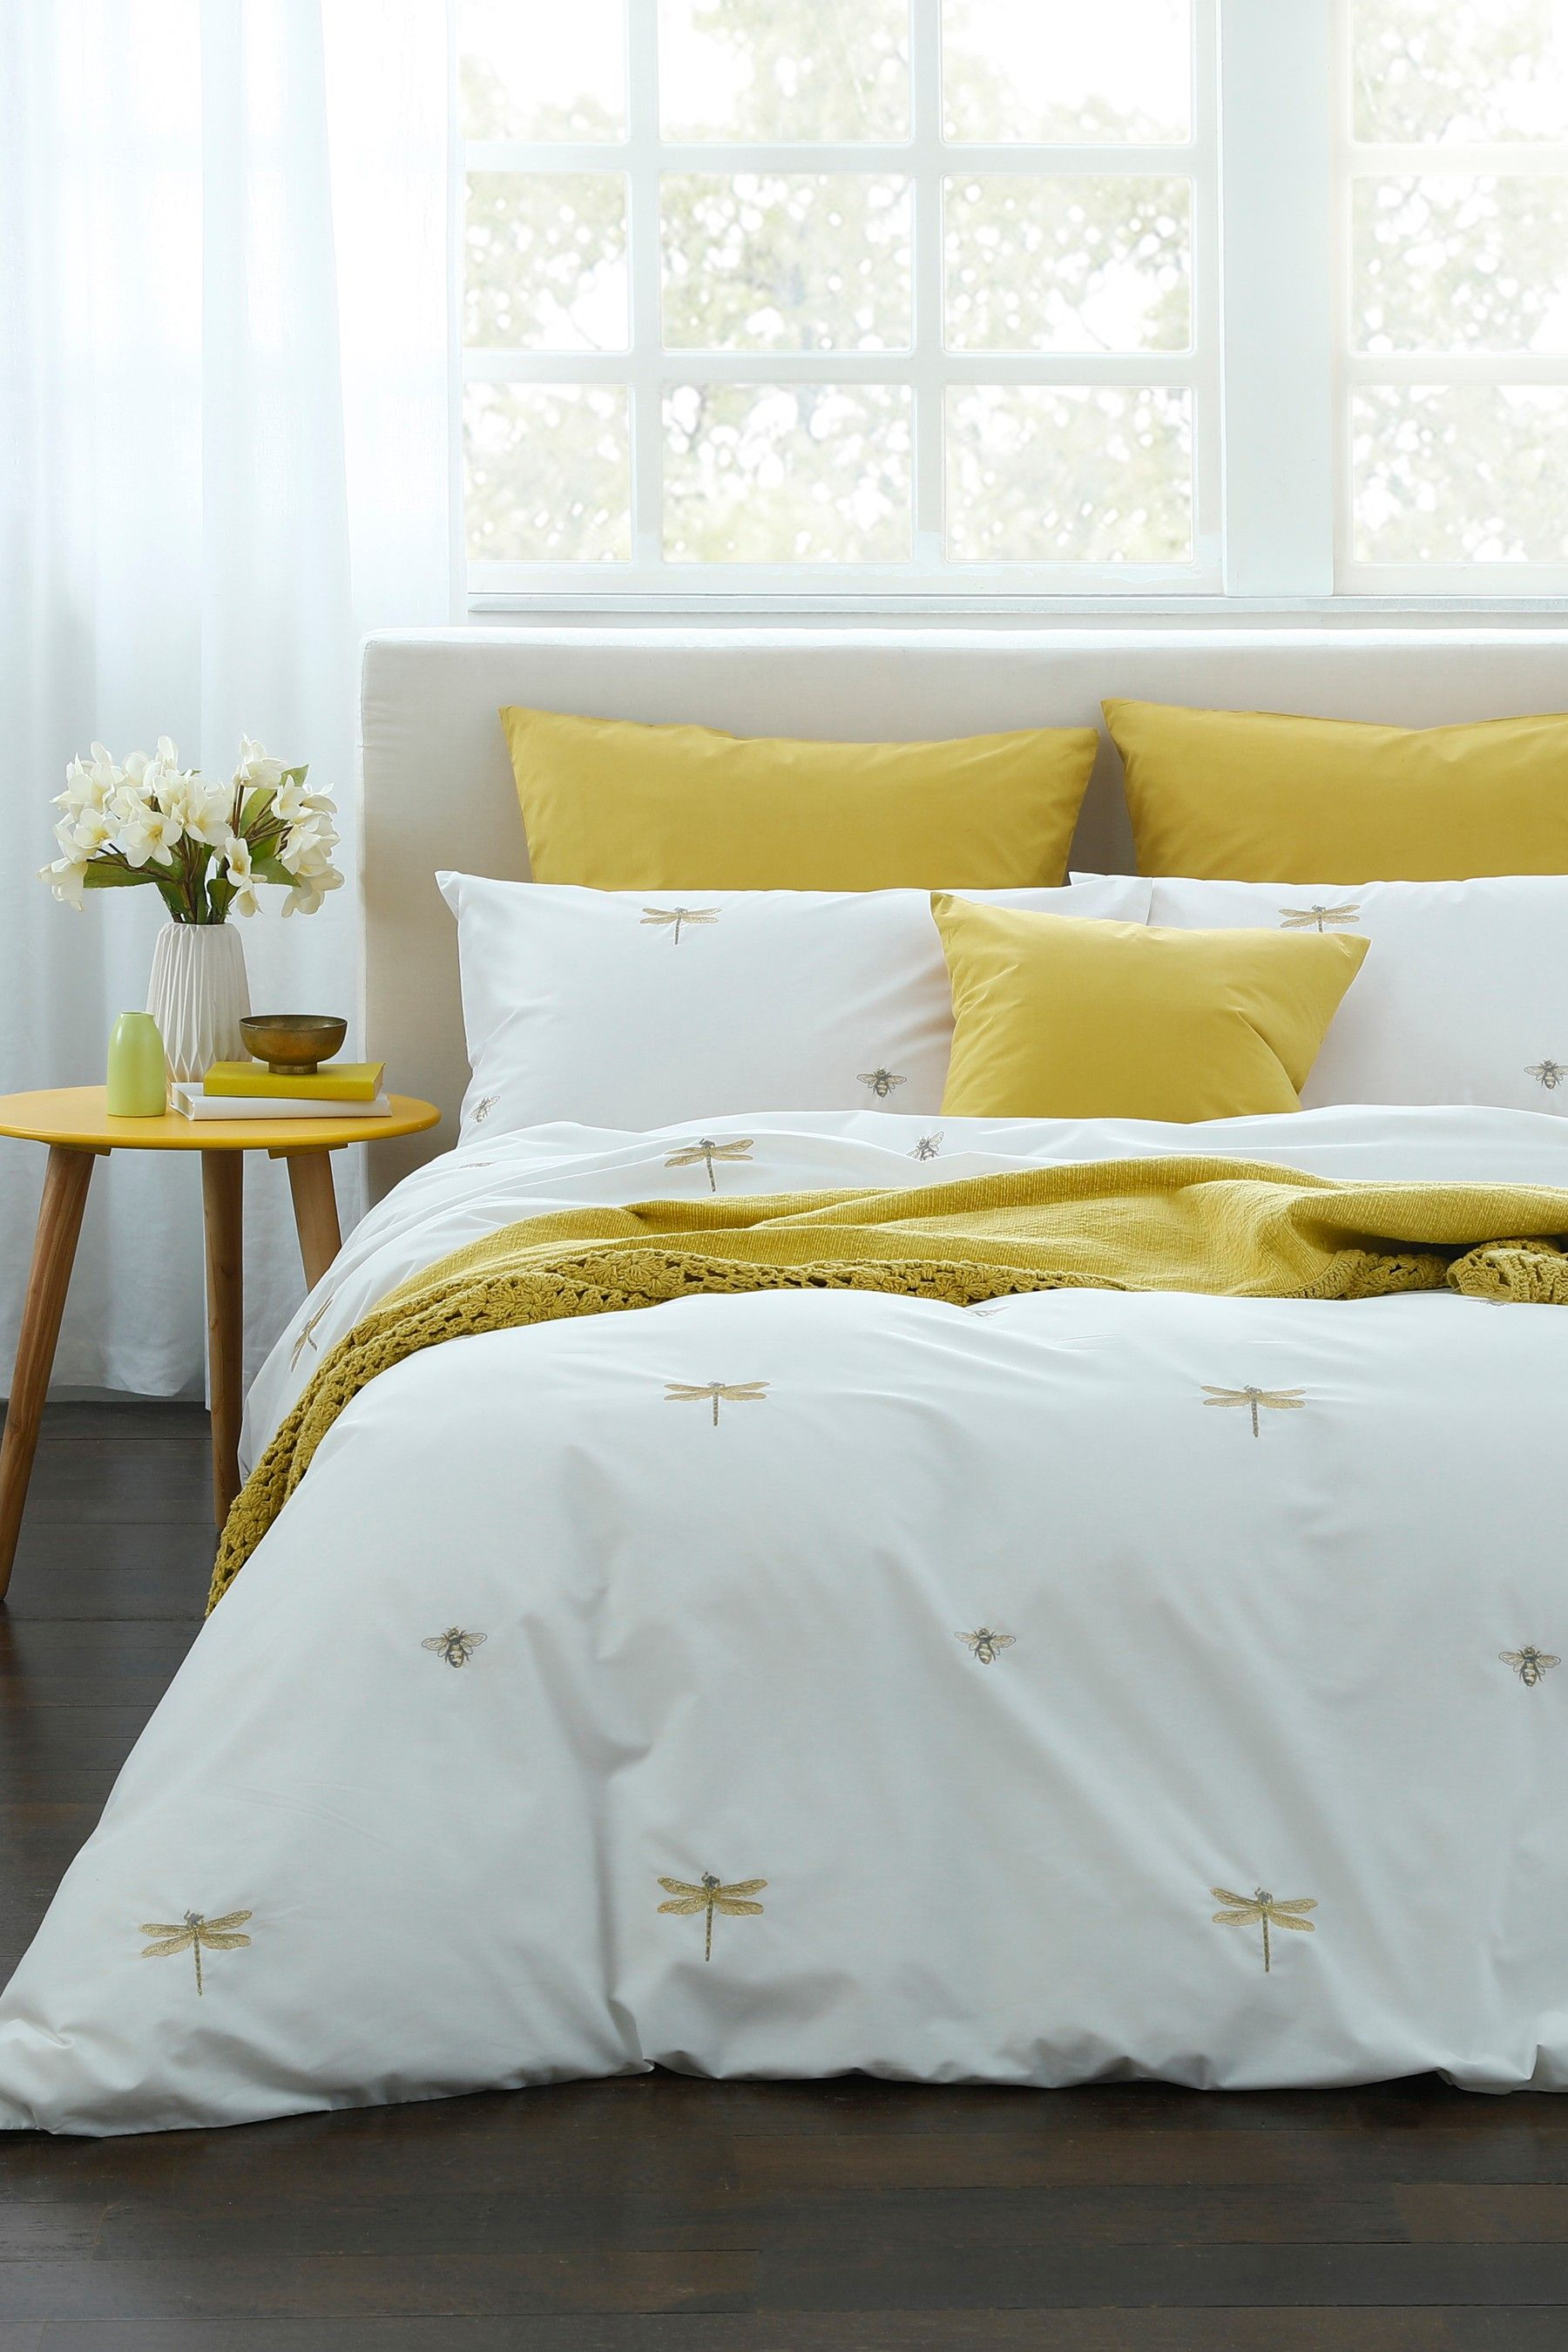 Embroidered Bugs Duvet Cover and Pillowcase Set Duvet